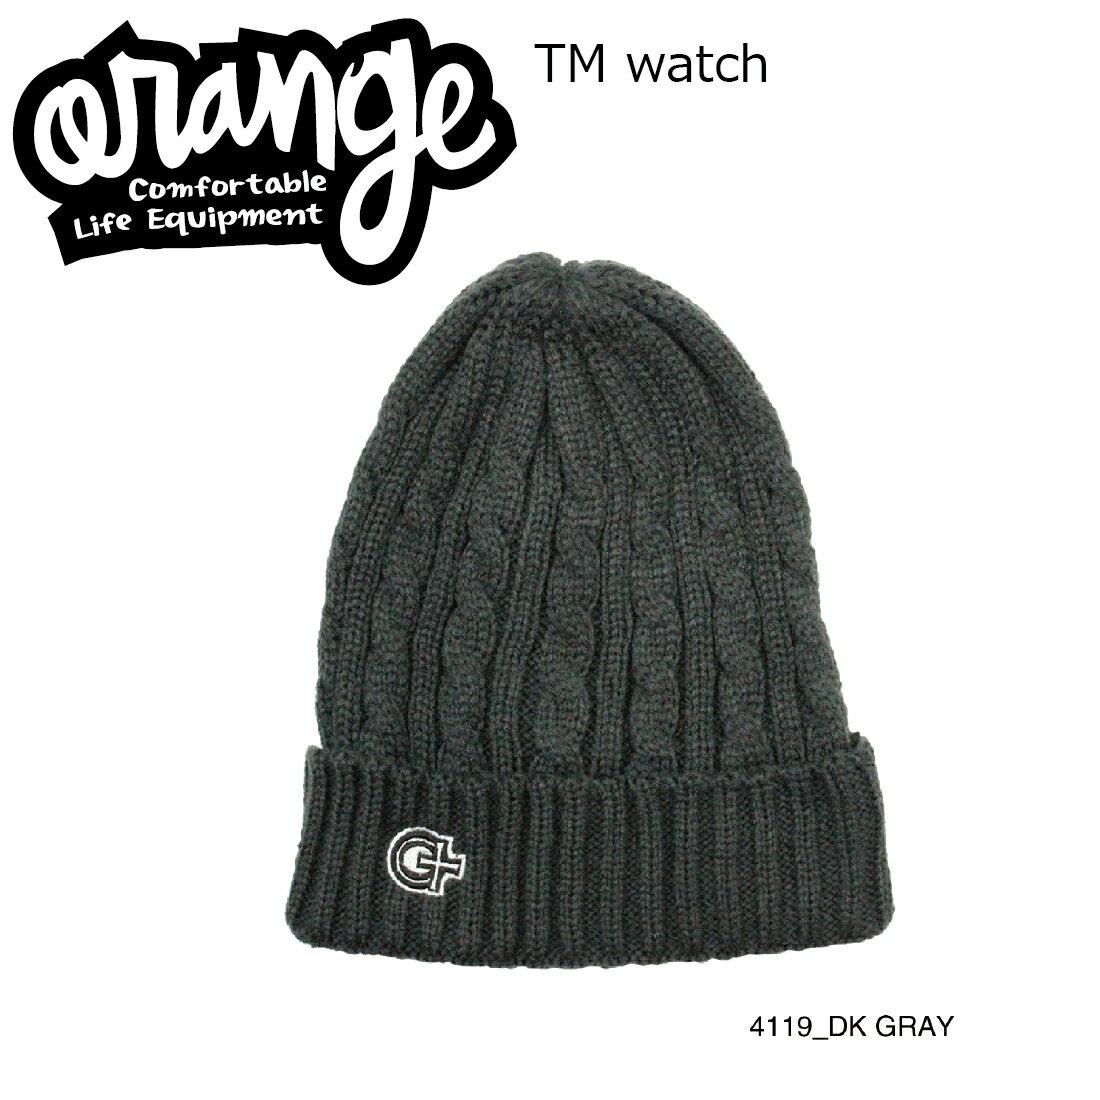 Oran'ge Tm Watch Cap Beanie 4119 DARK GRAY オレンジ ティーエム ワッチ キャップ ビーニー ニットキャップ 2つ折り